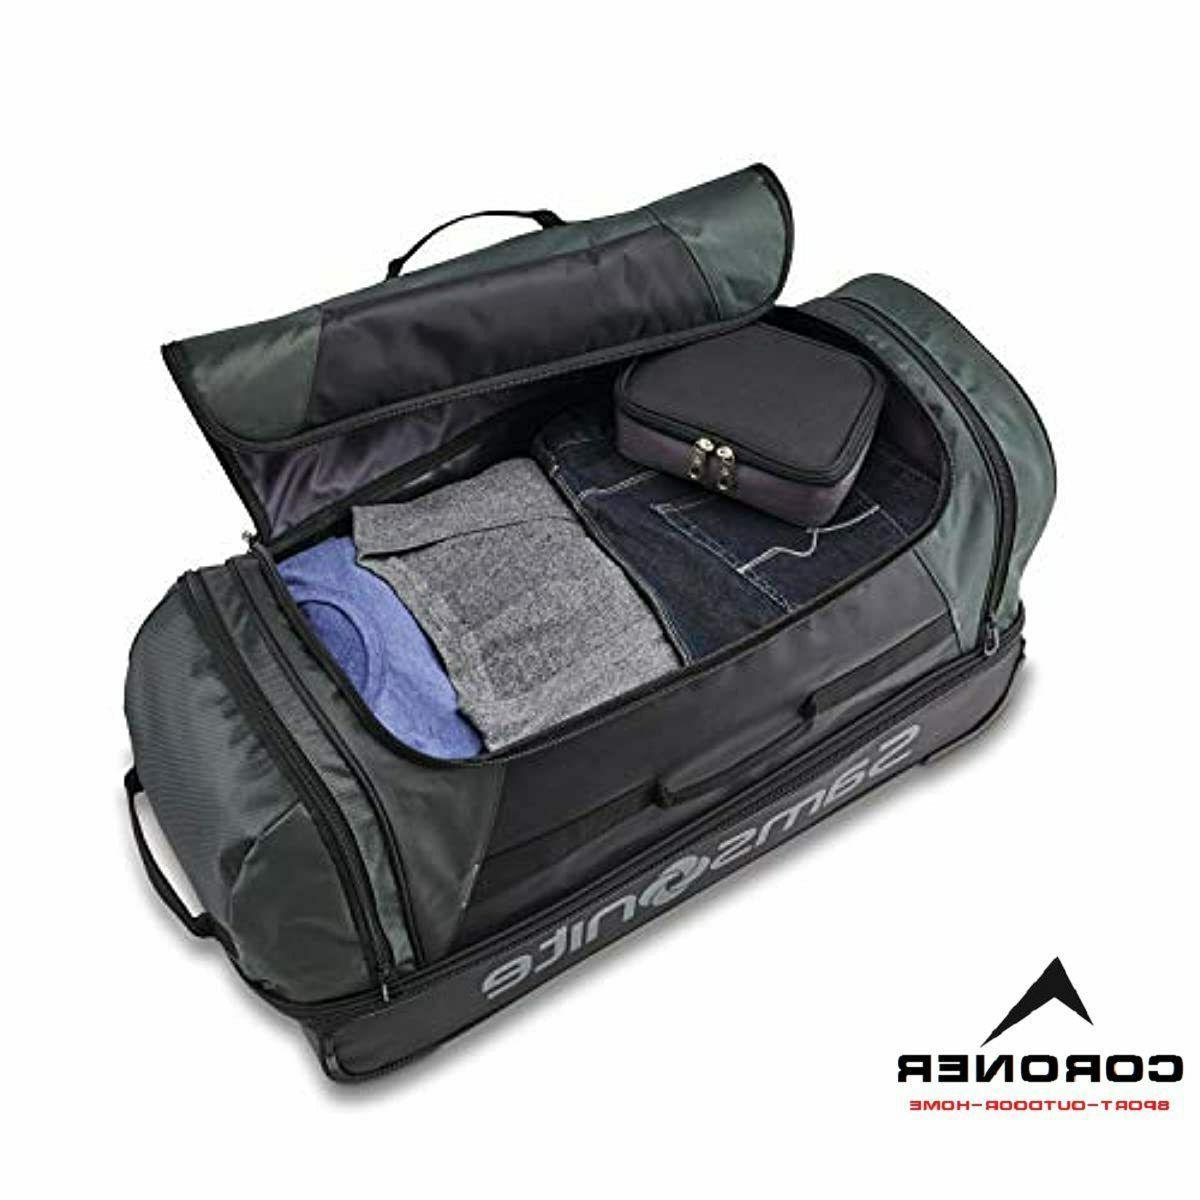 Bottom Wheeled Bag, Green/Black,